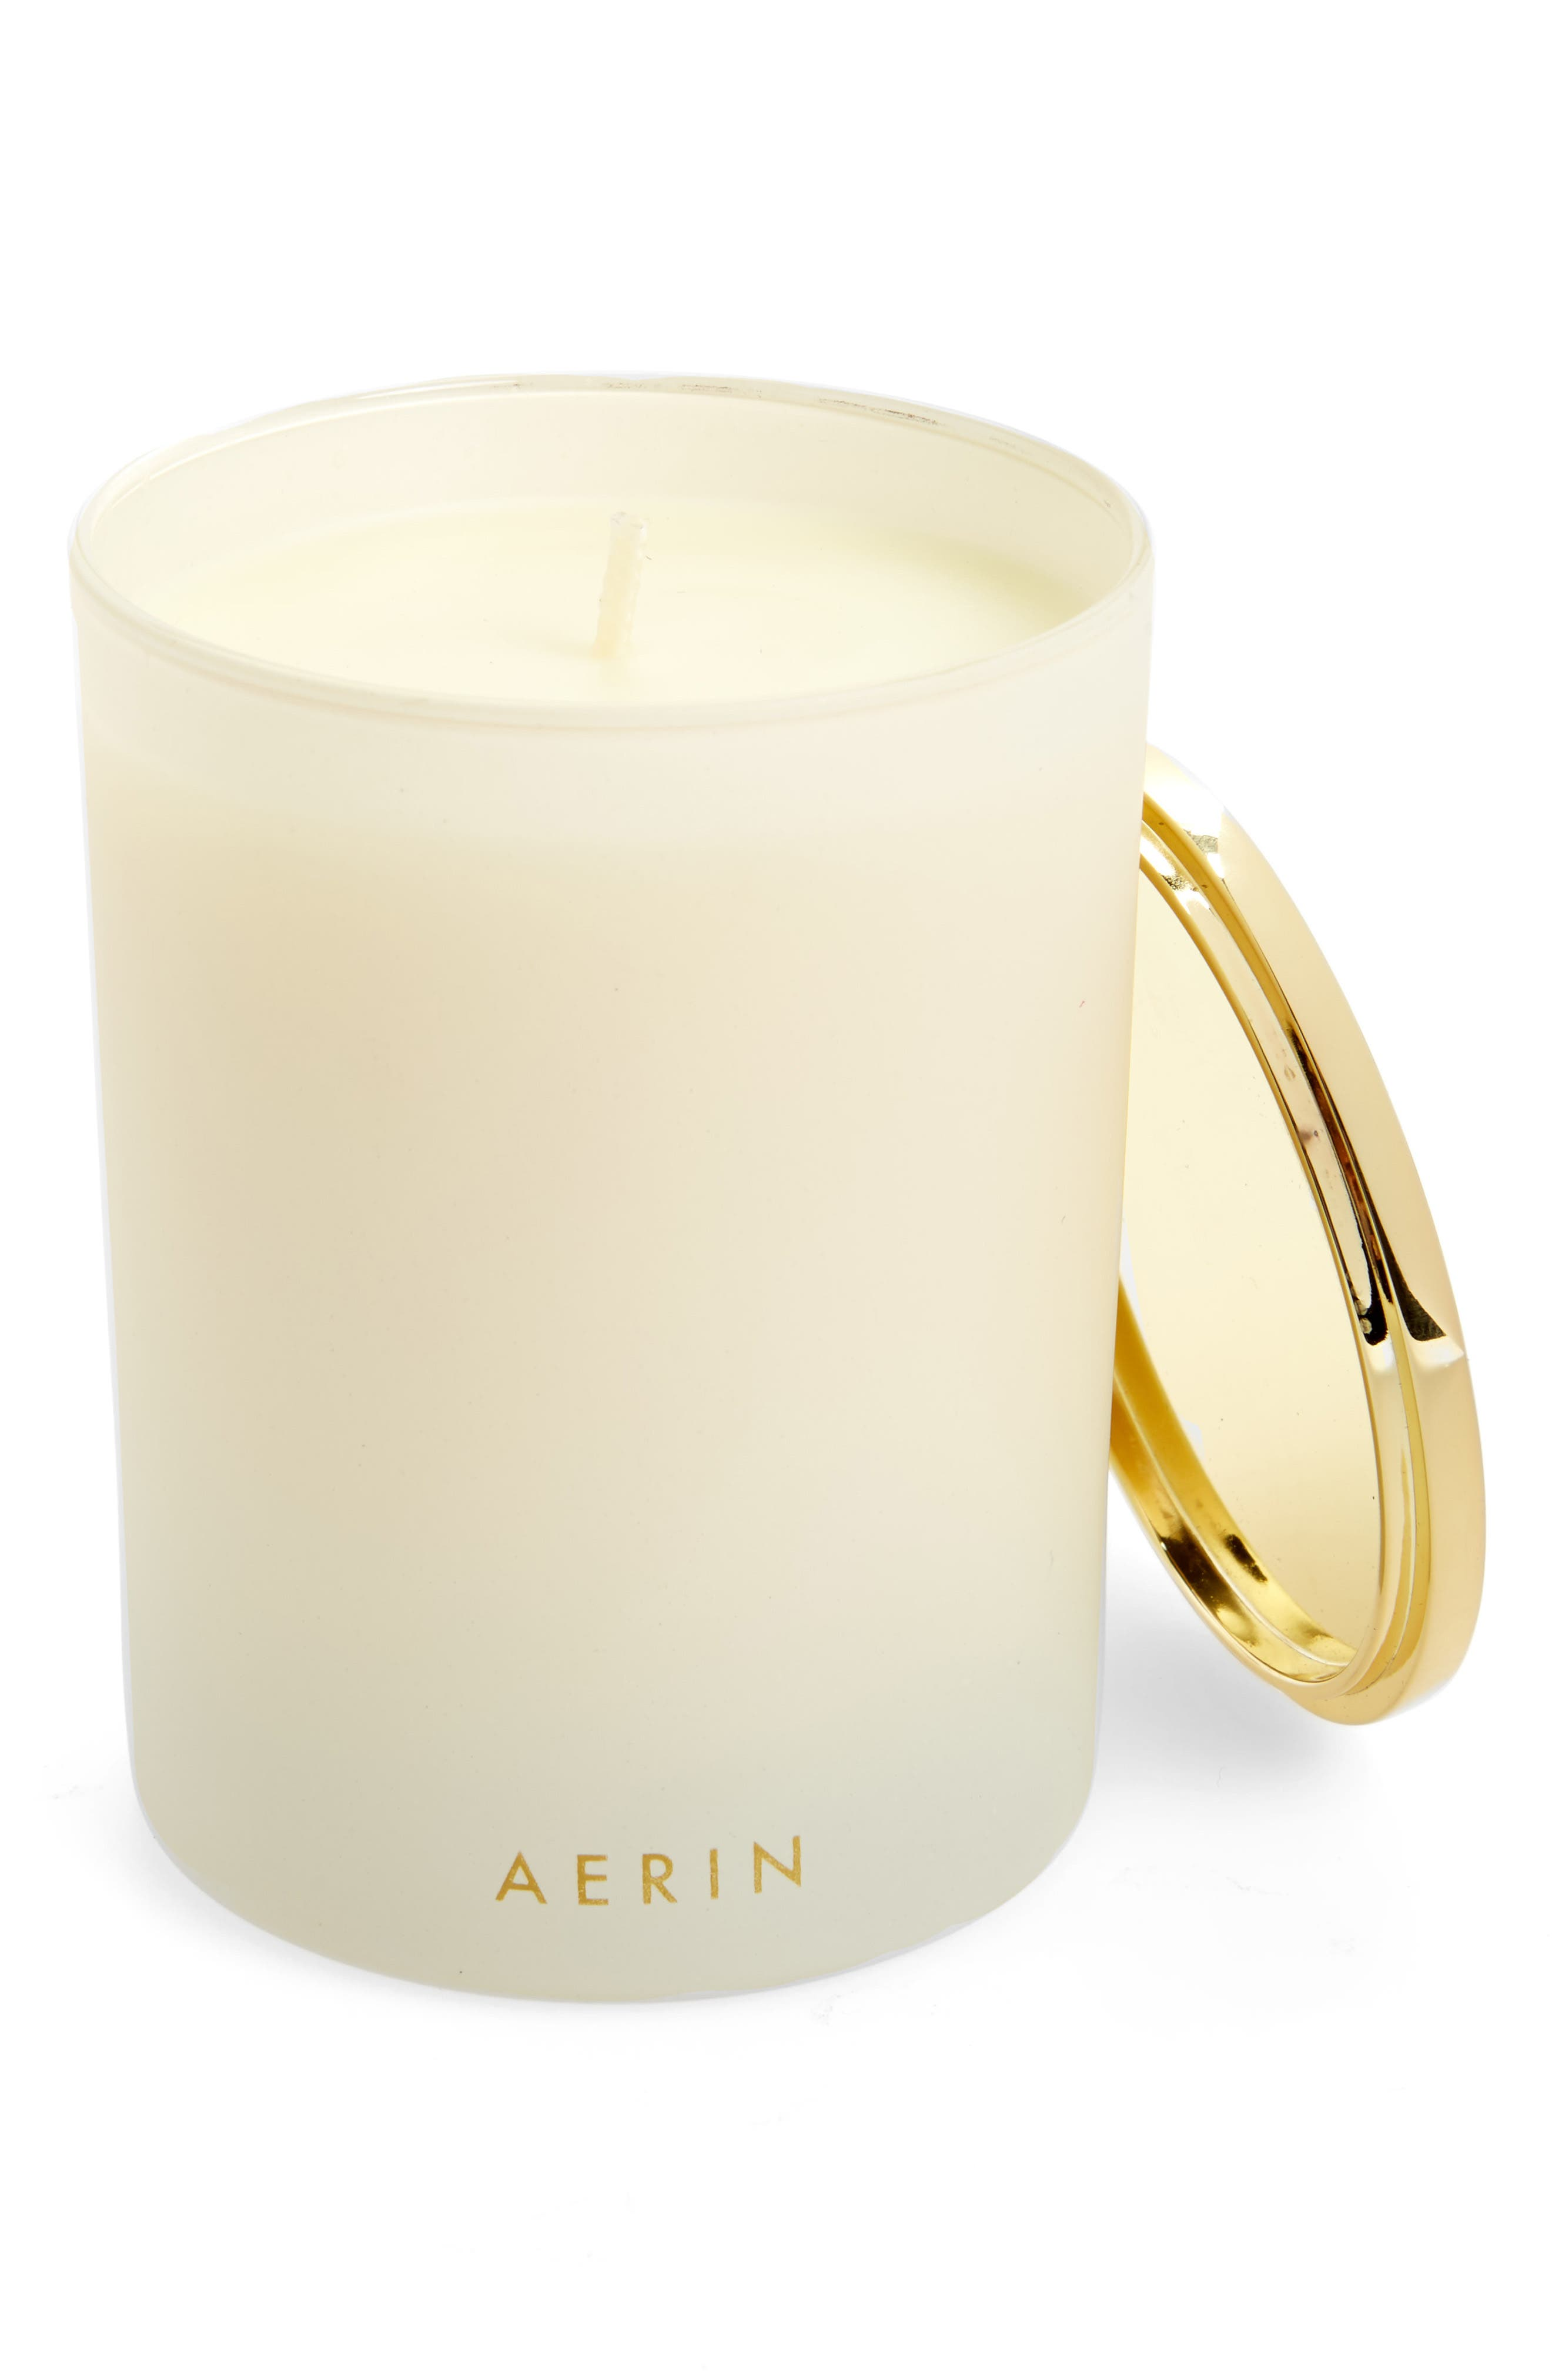 AERIN Tuberose Candle